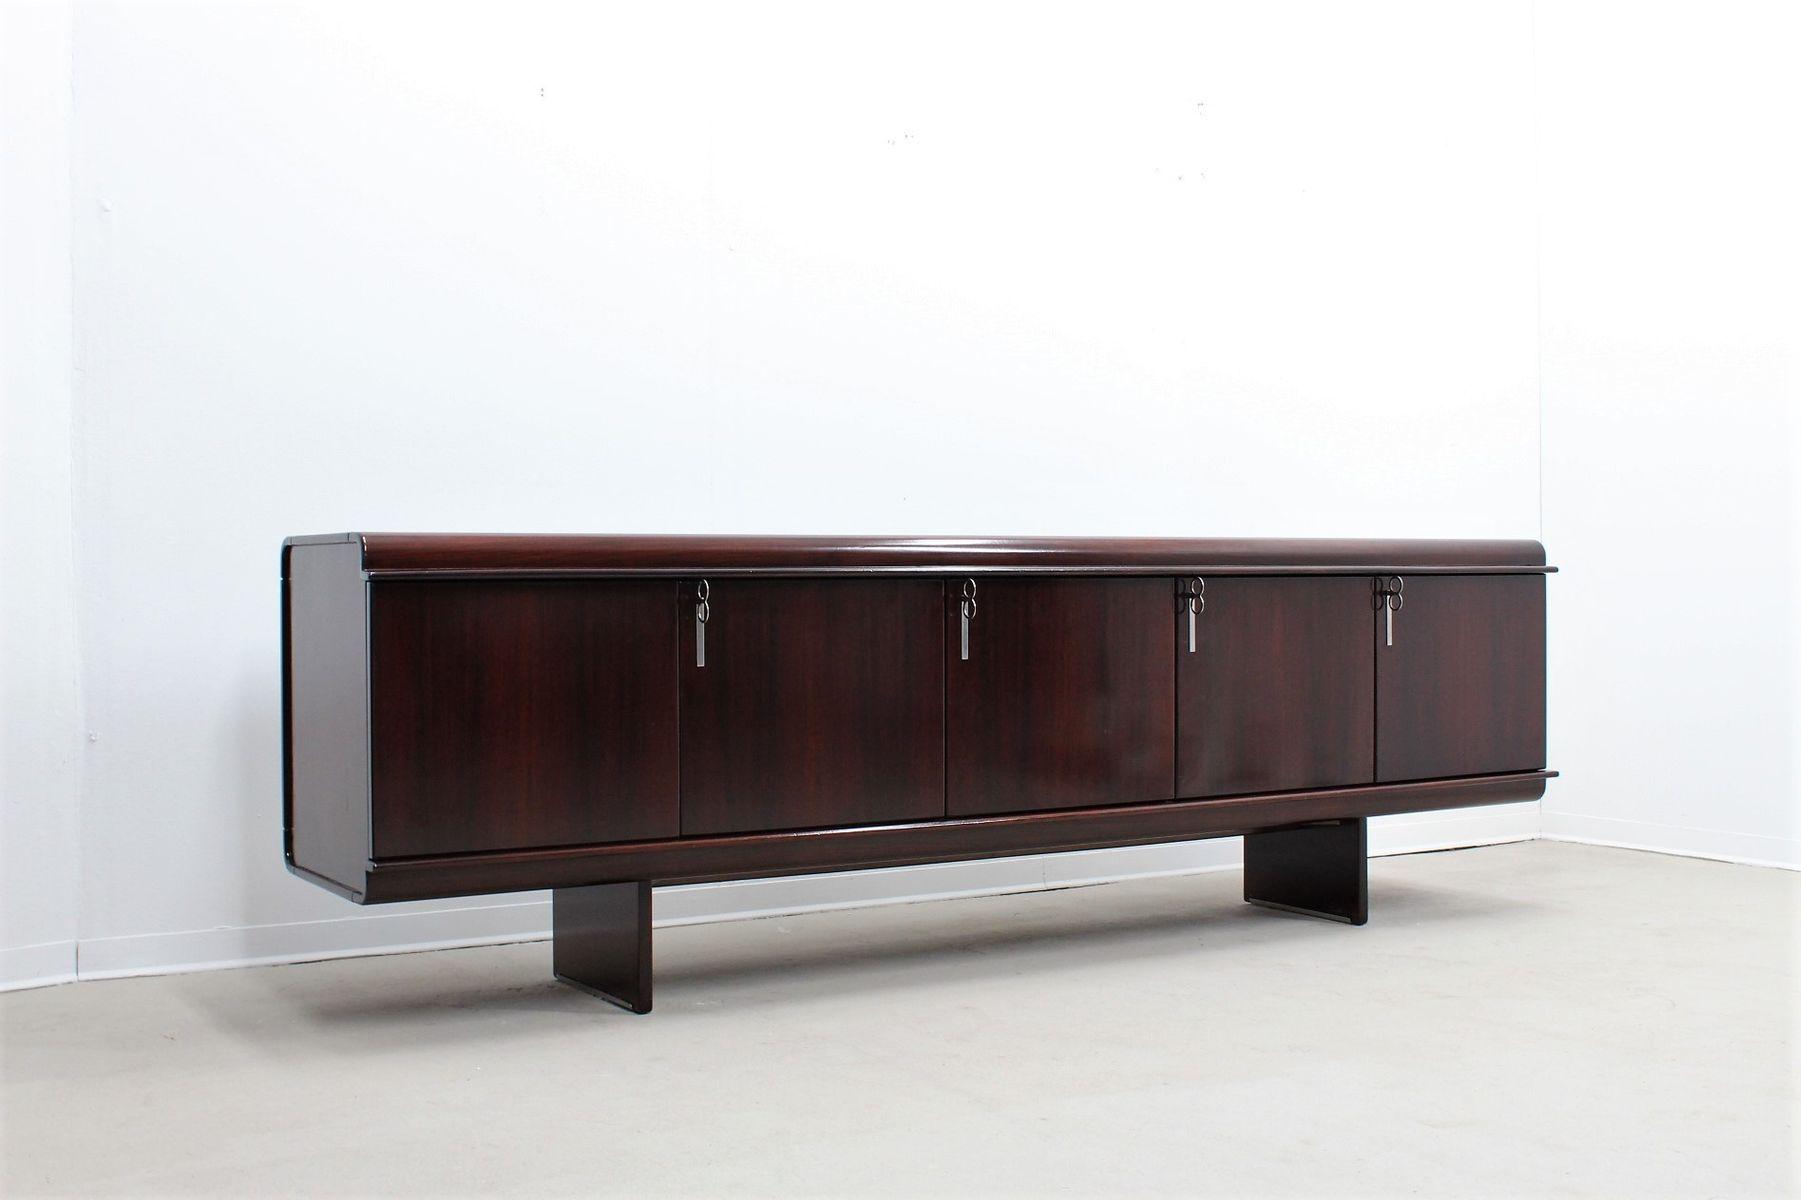 Sideboard by vittorio introini for saporiti italia 1960s for sale at pamono - Mobili vintage anni 60 ...